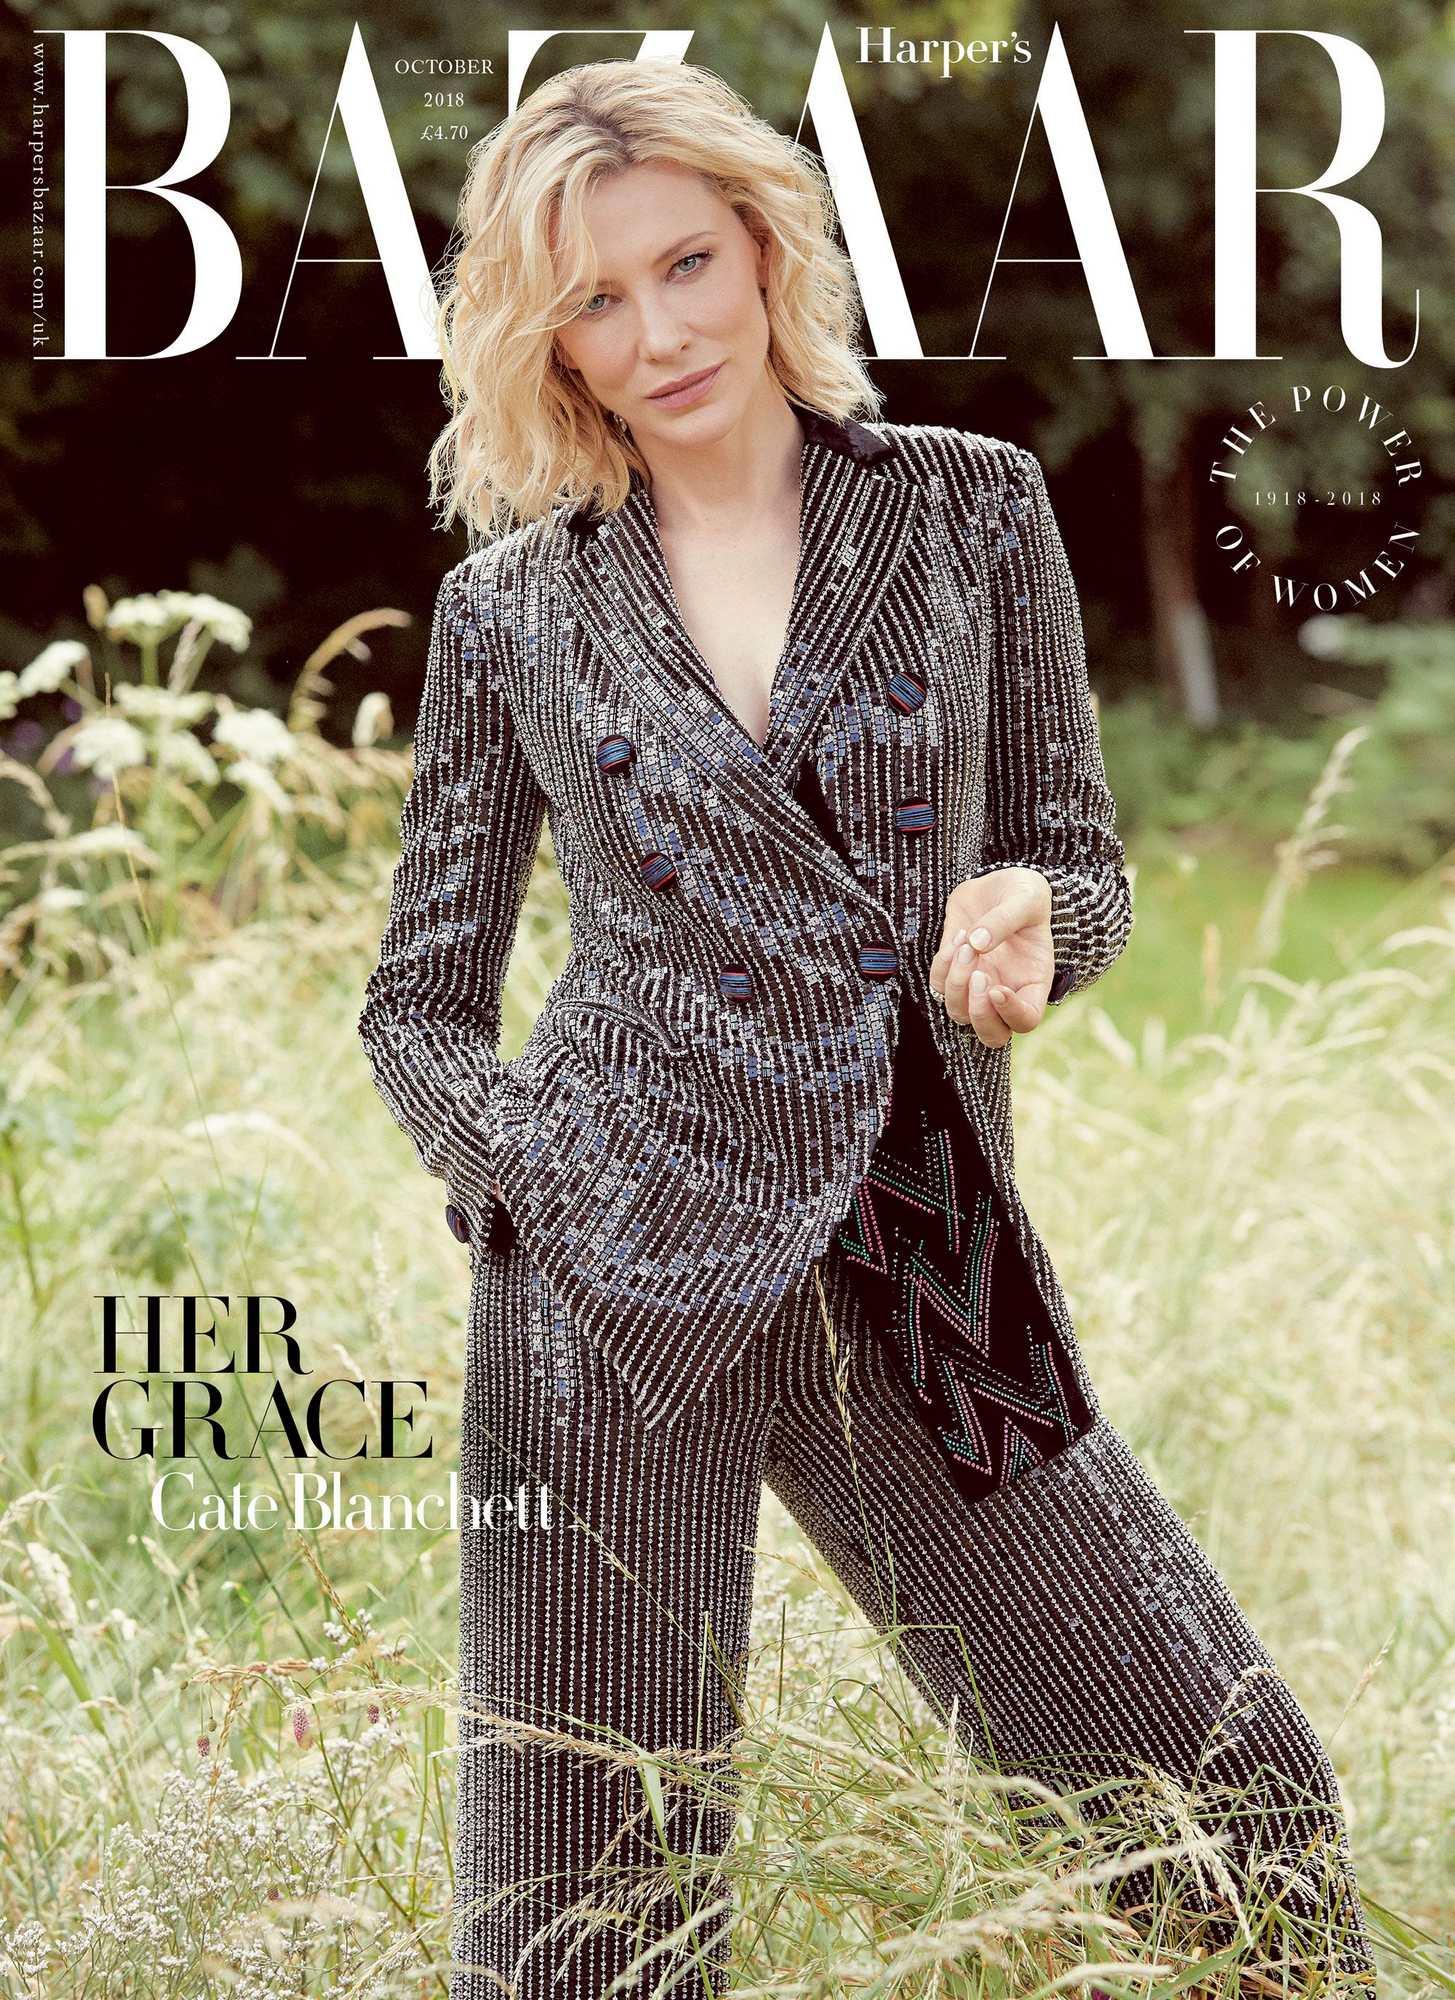 Cate-Blanchett-UK-Harper's-Bazaar-October-201857ca76959145424.jpg